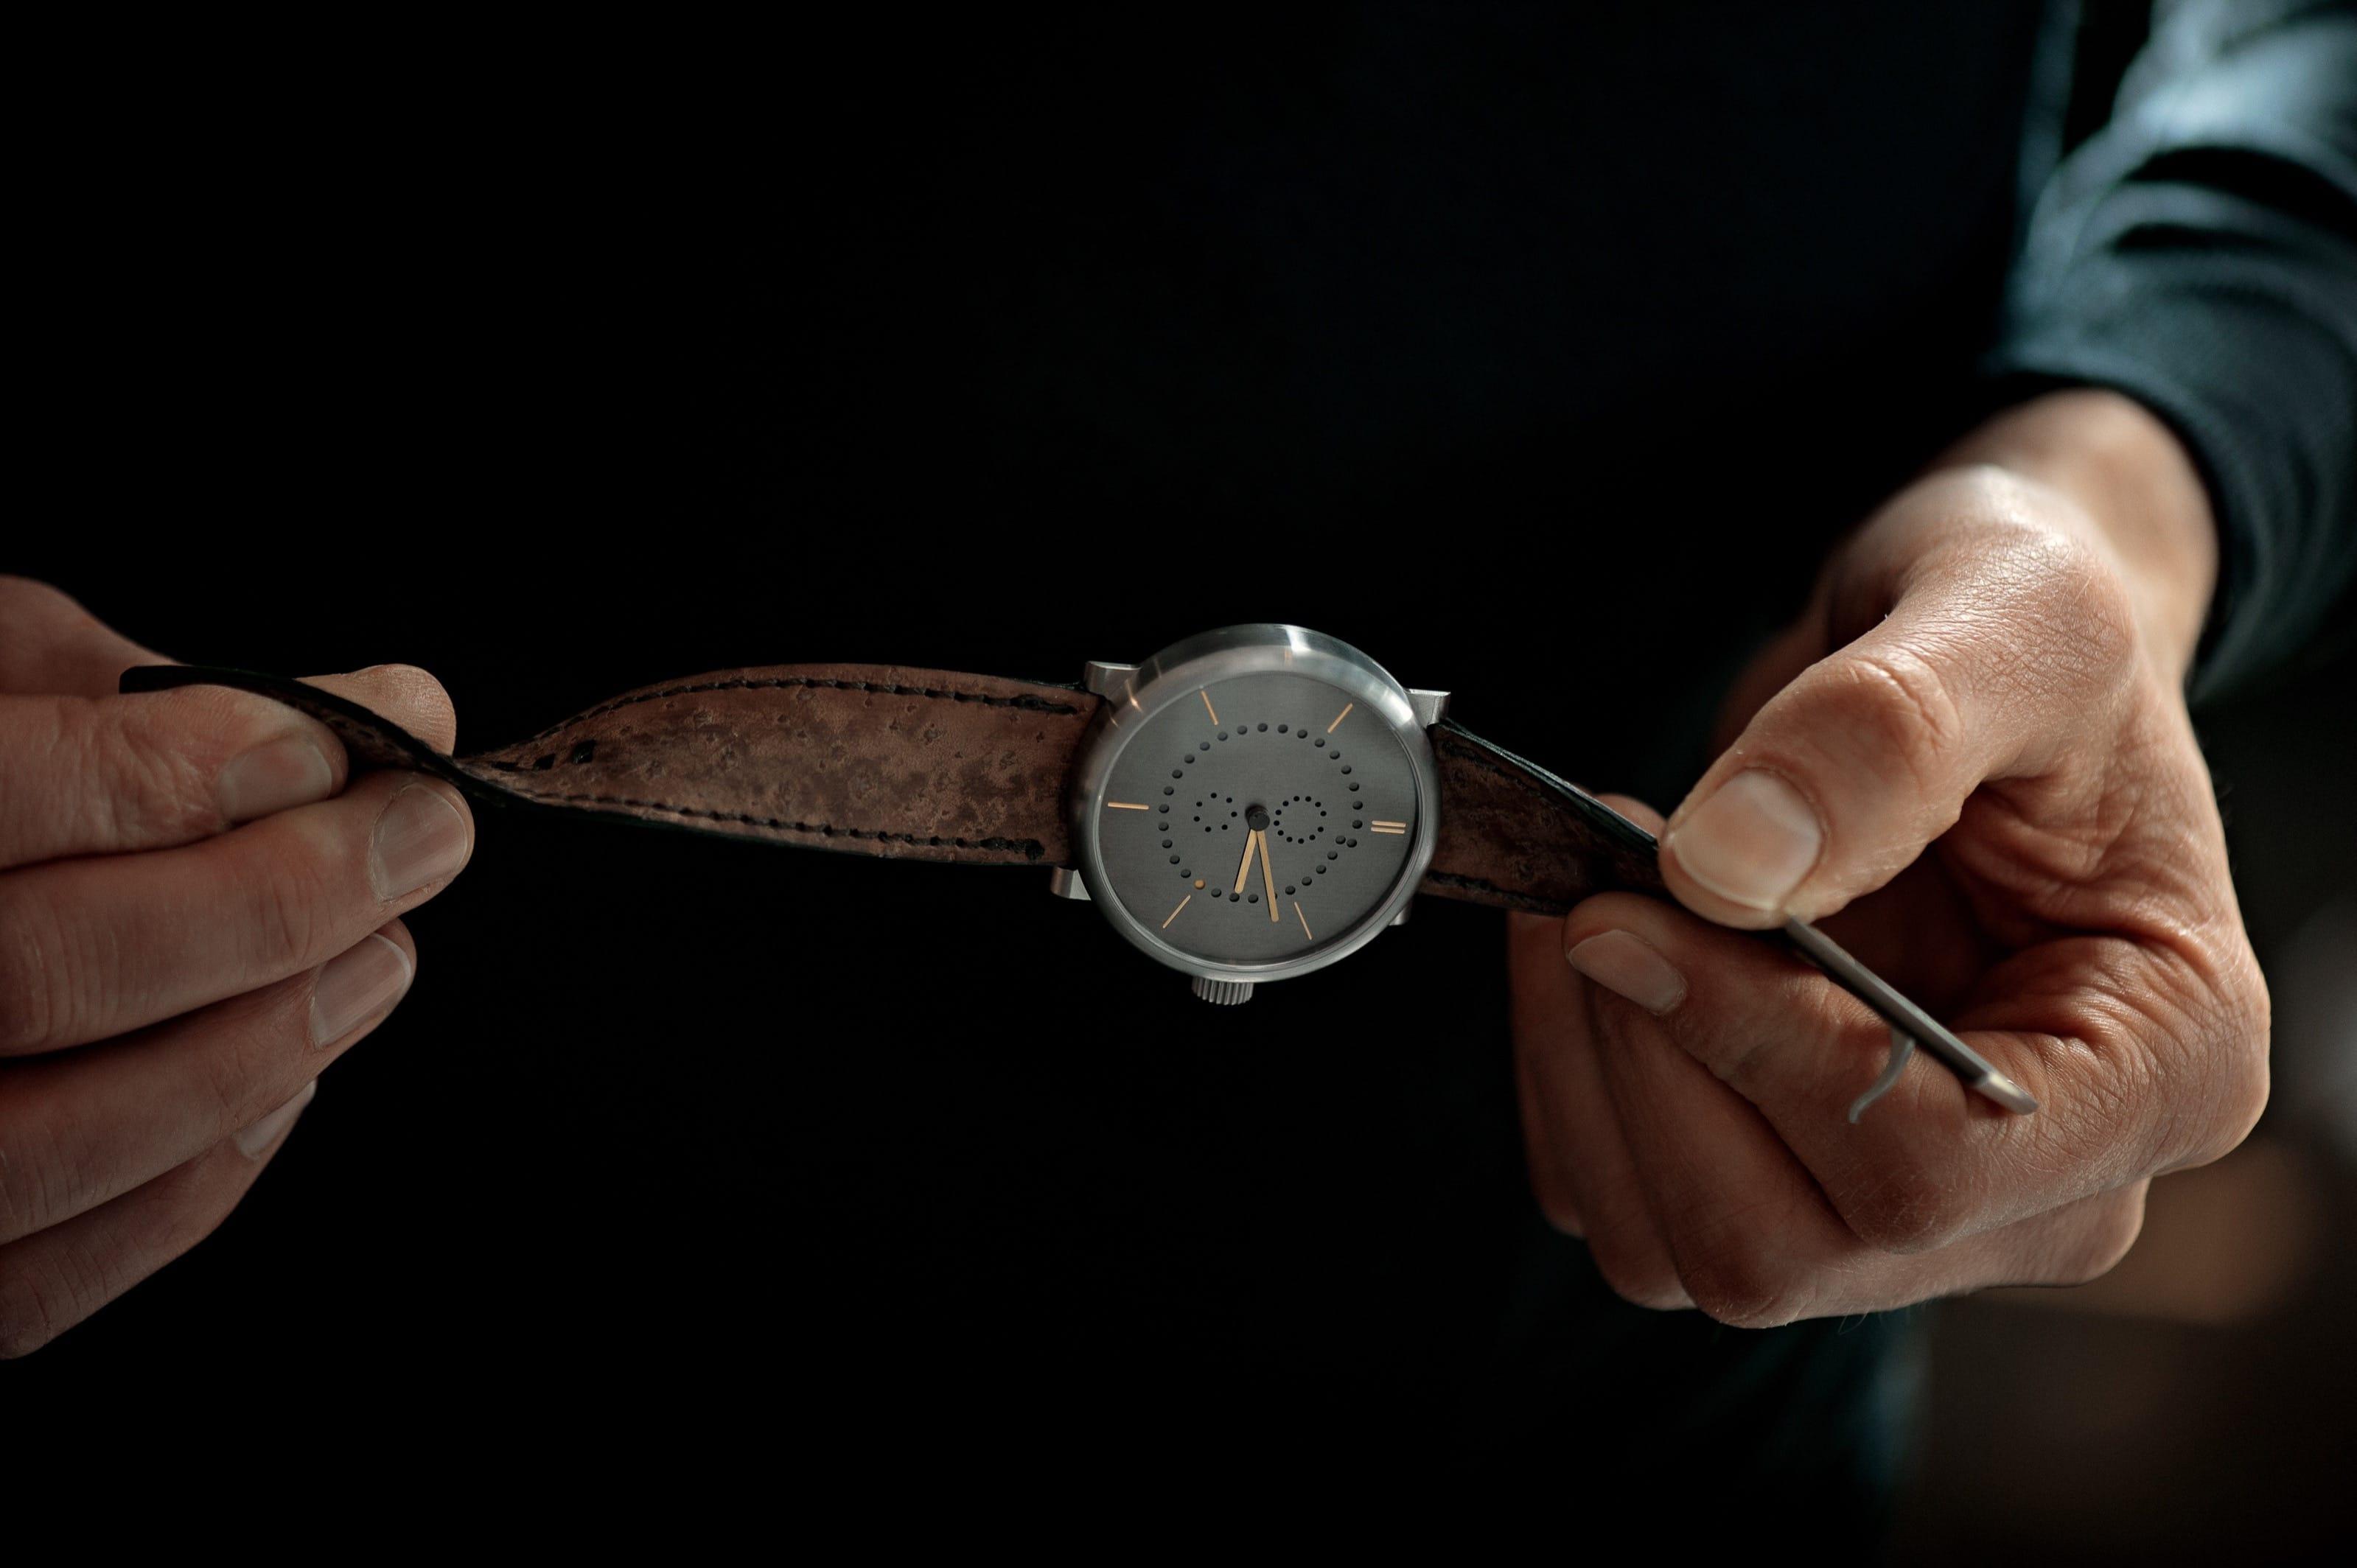 annual calendar watch (42mm grade 5 titanium case with patina dial by ochs und junior, sturgeon leather strap)